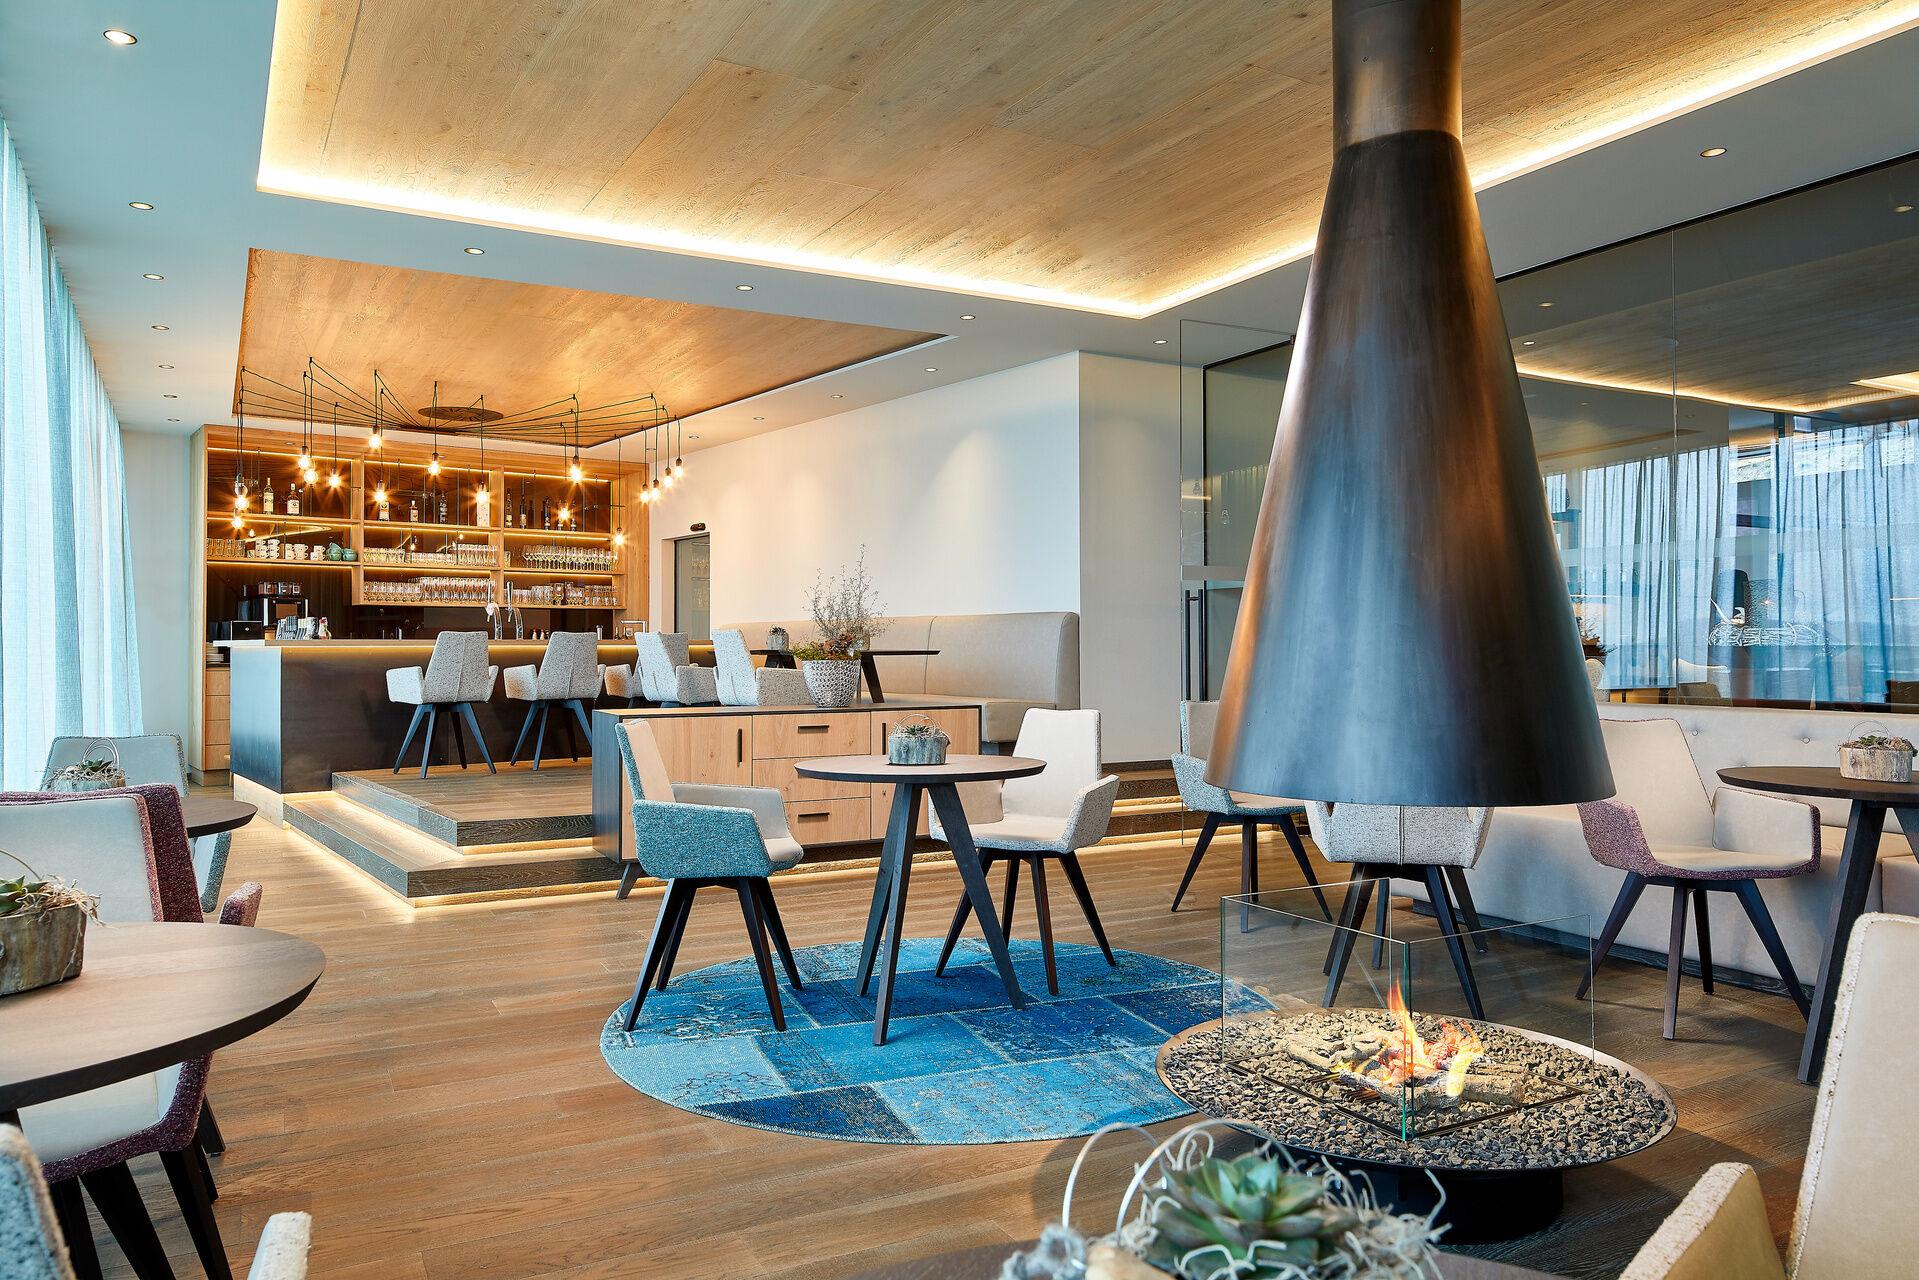 infos wellnesshotel hotels 4 sterne h ttenhof bayern wellnesshotels bayerischer wald. Black Bedroom Furniture Sets. Home Design Ideas